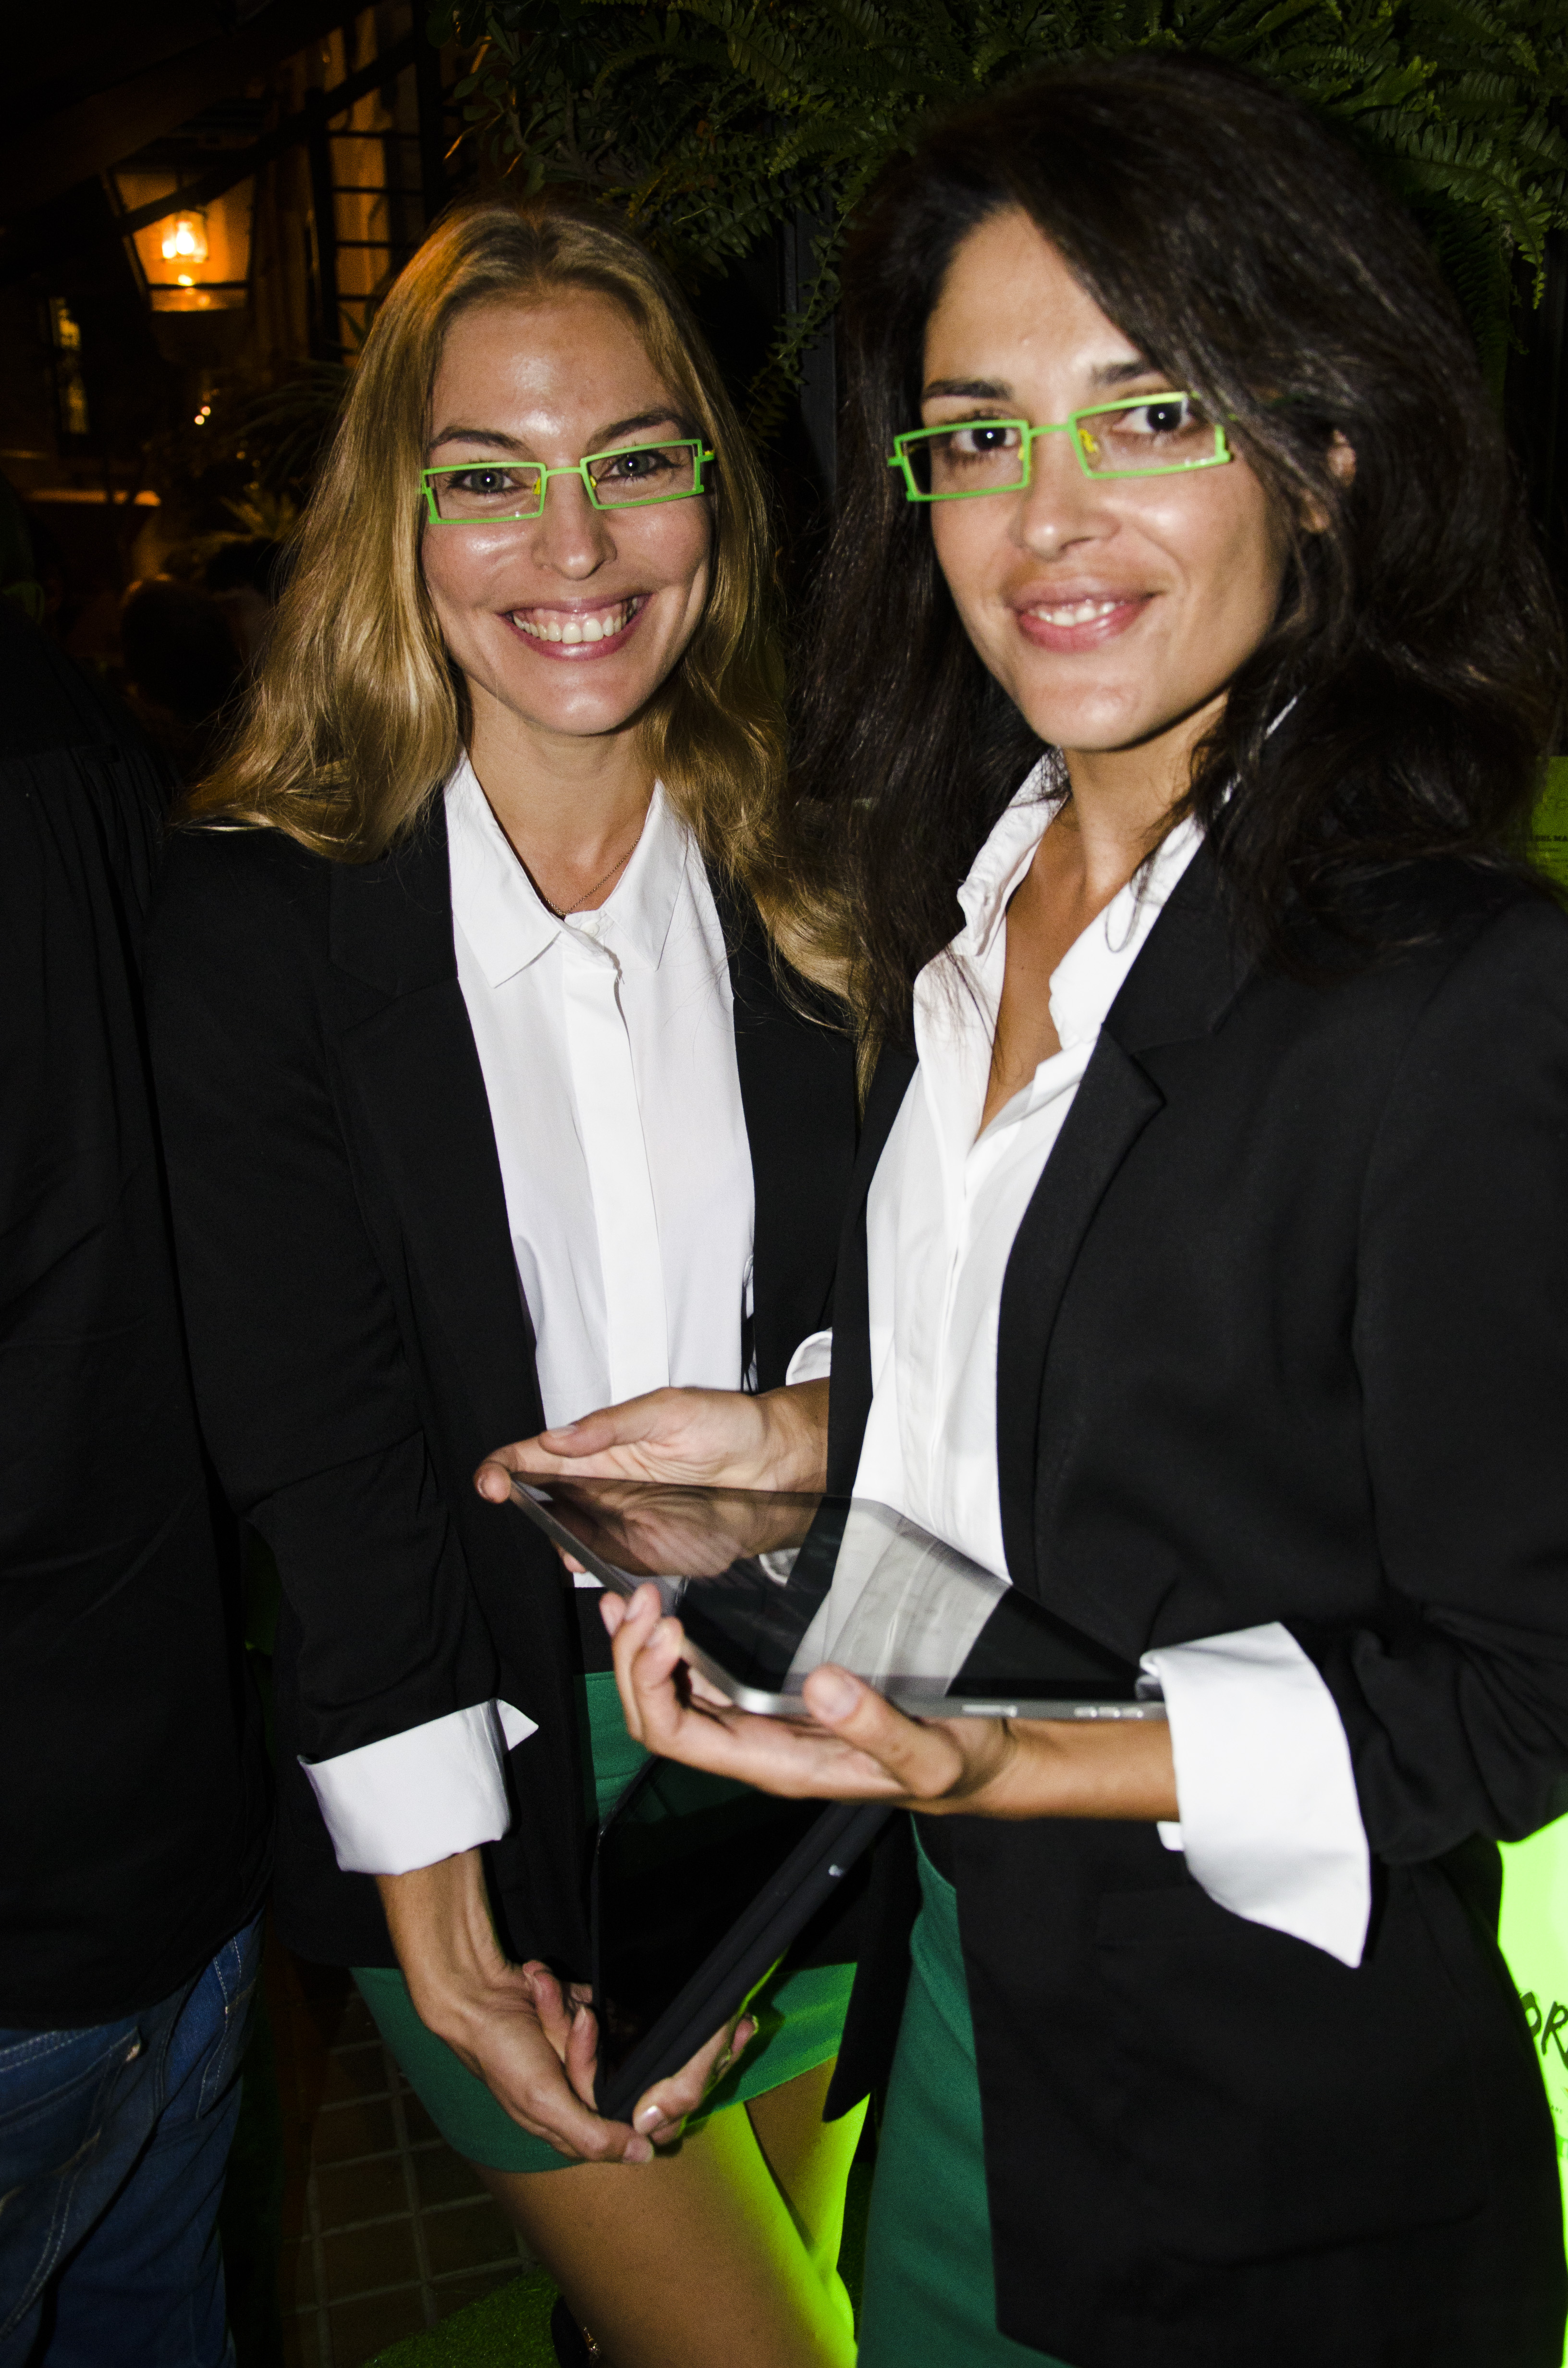 Green Glasses (Bcn)